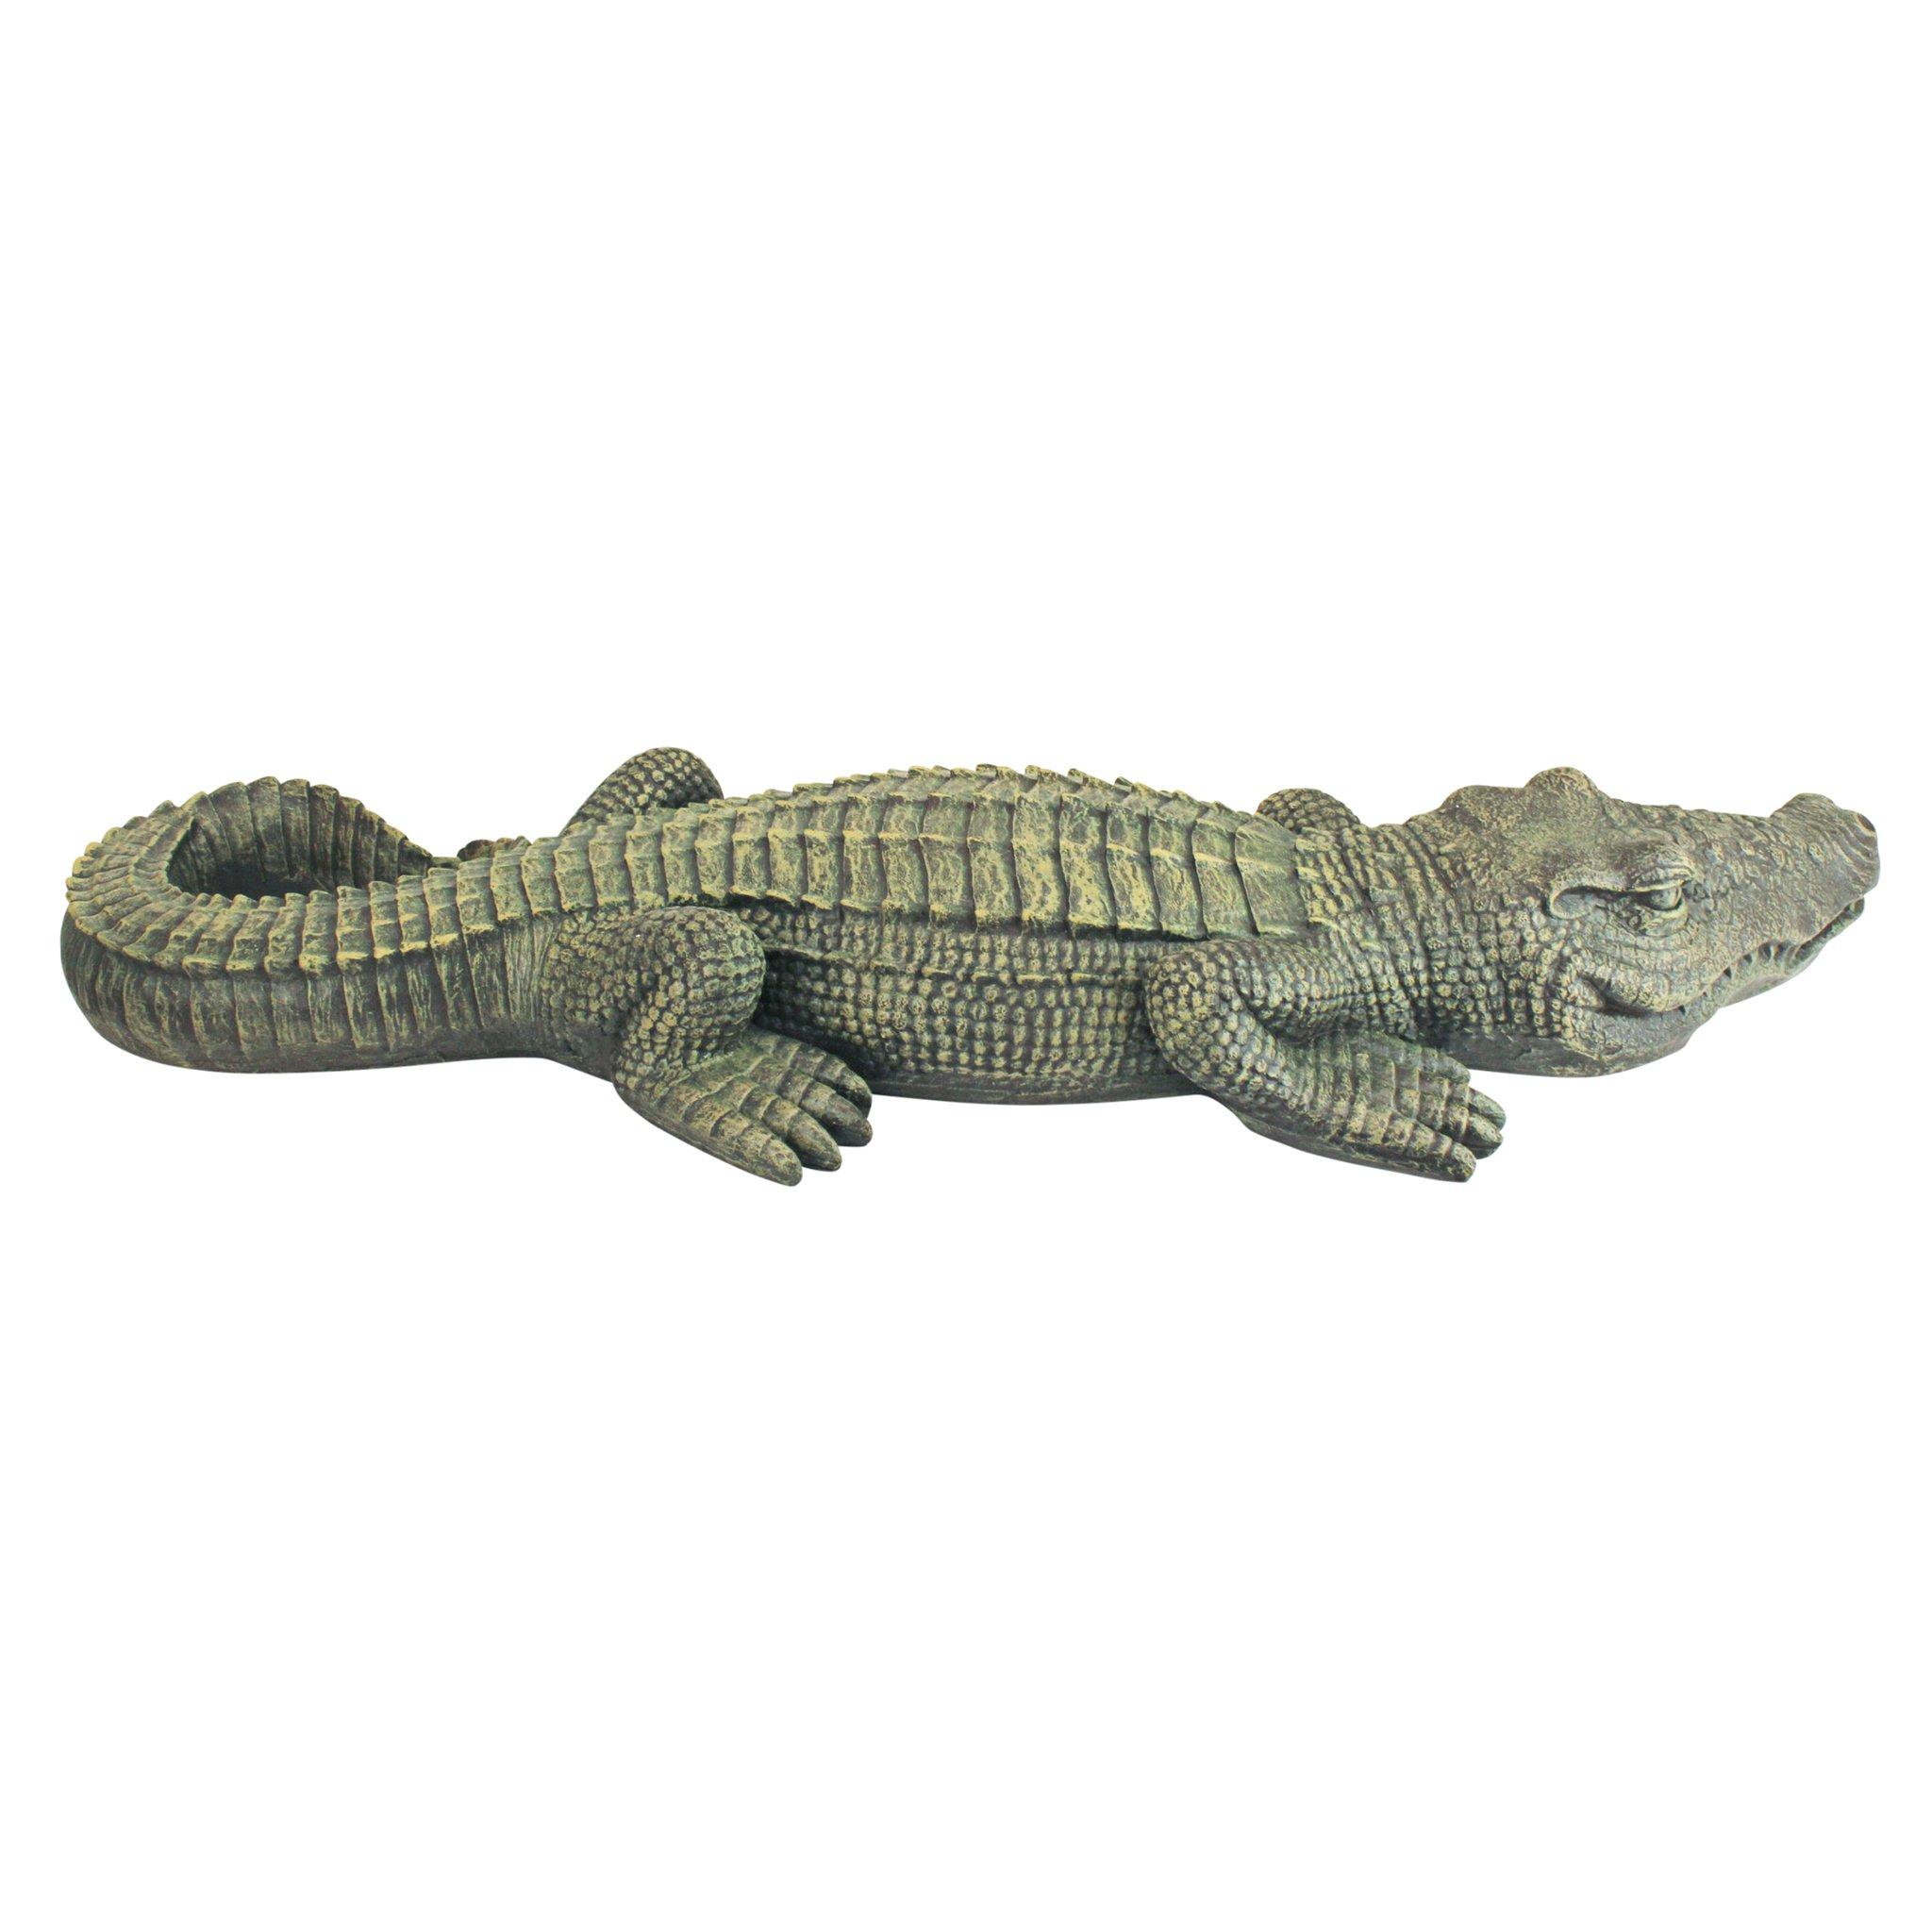 Design Toscano The Swamp Beast Lawn Alligator Crocodile Garden Sculpture, 37 Inch, Polyresin, Full Color by Design Toscano (Image #4)